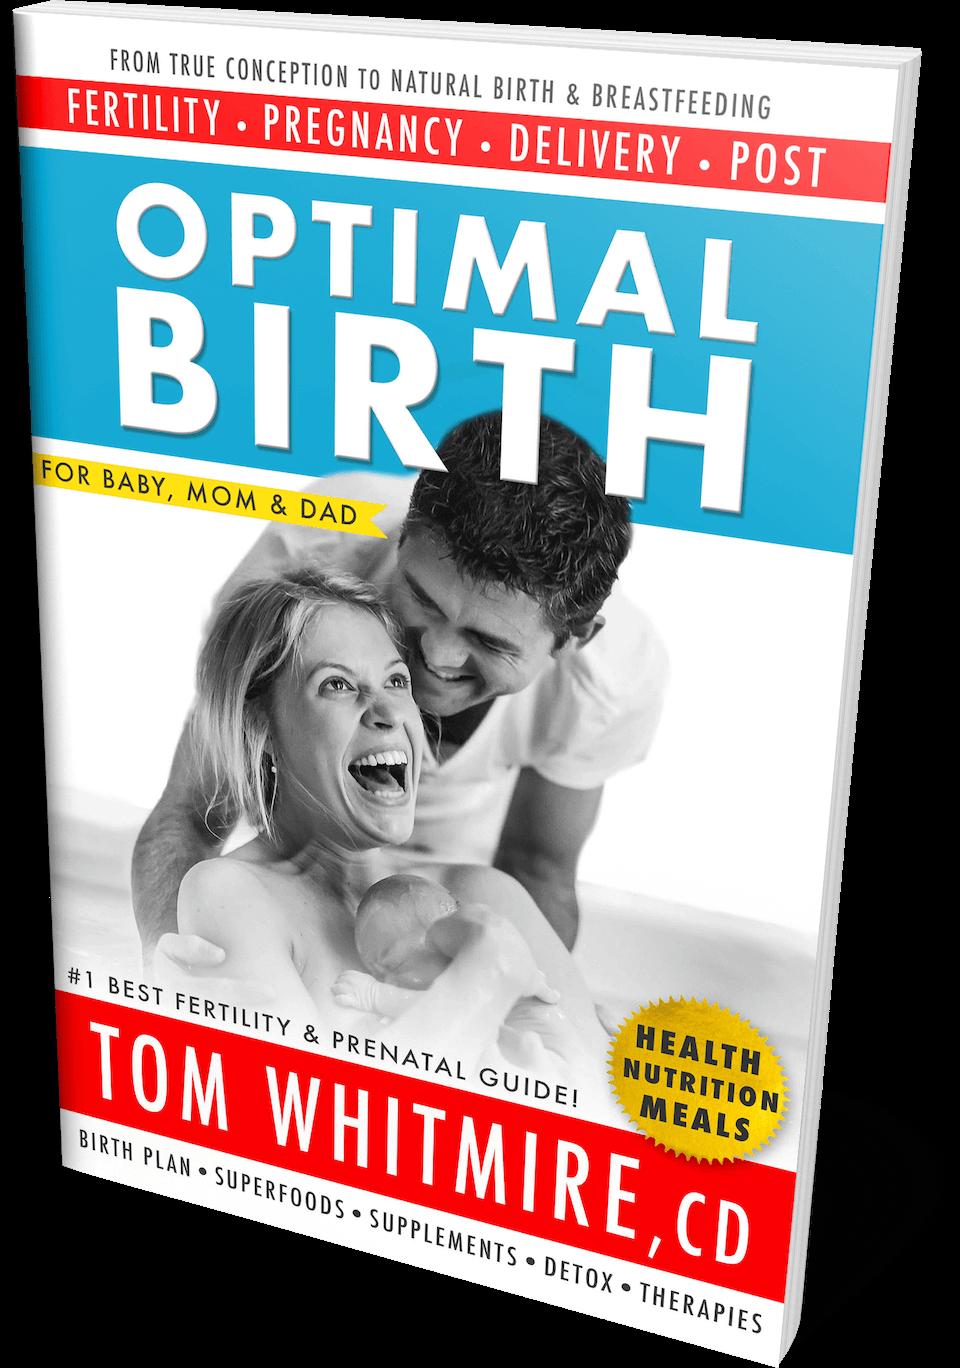 OPTIMAL BIRTH BOOK PRENATAL NUTRITION HEALTH By TOM WHITMIRE CD